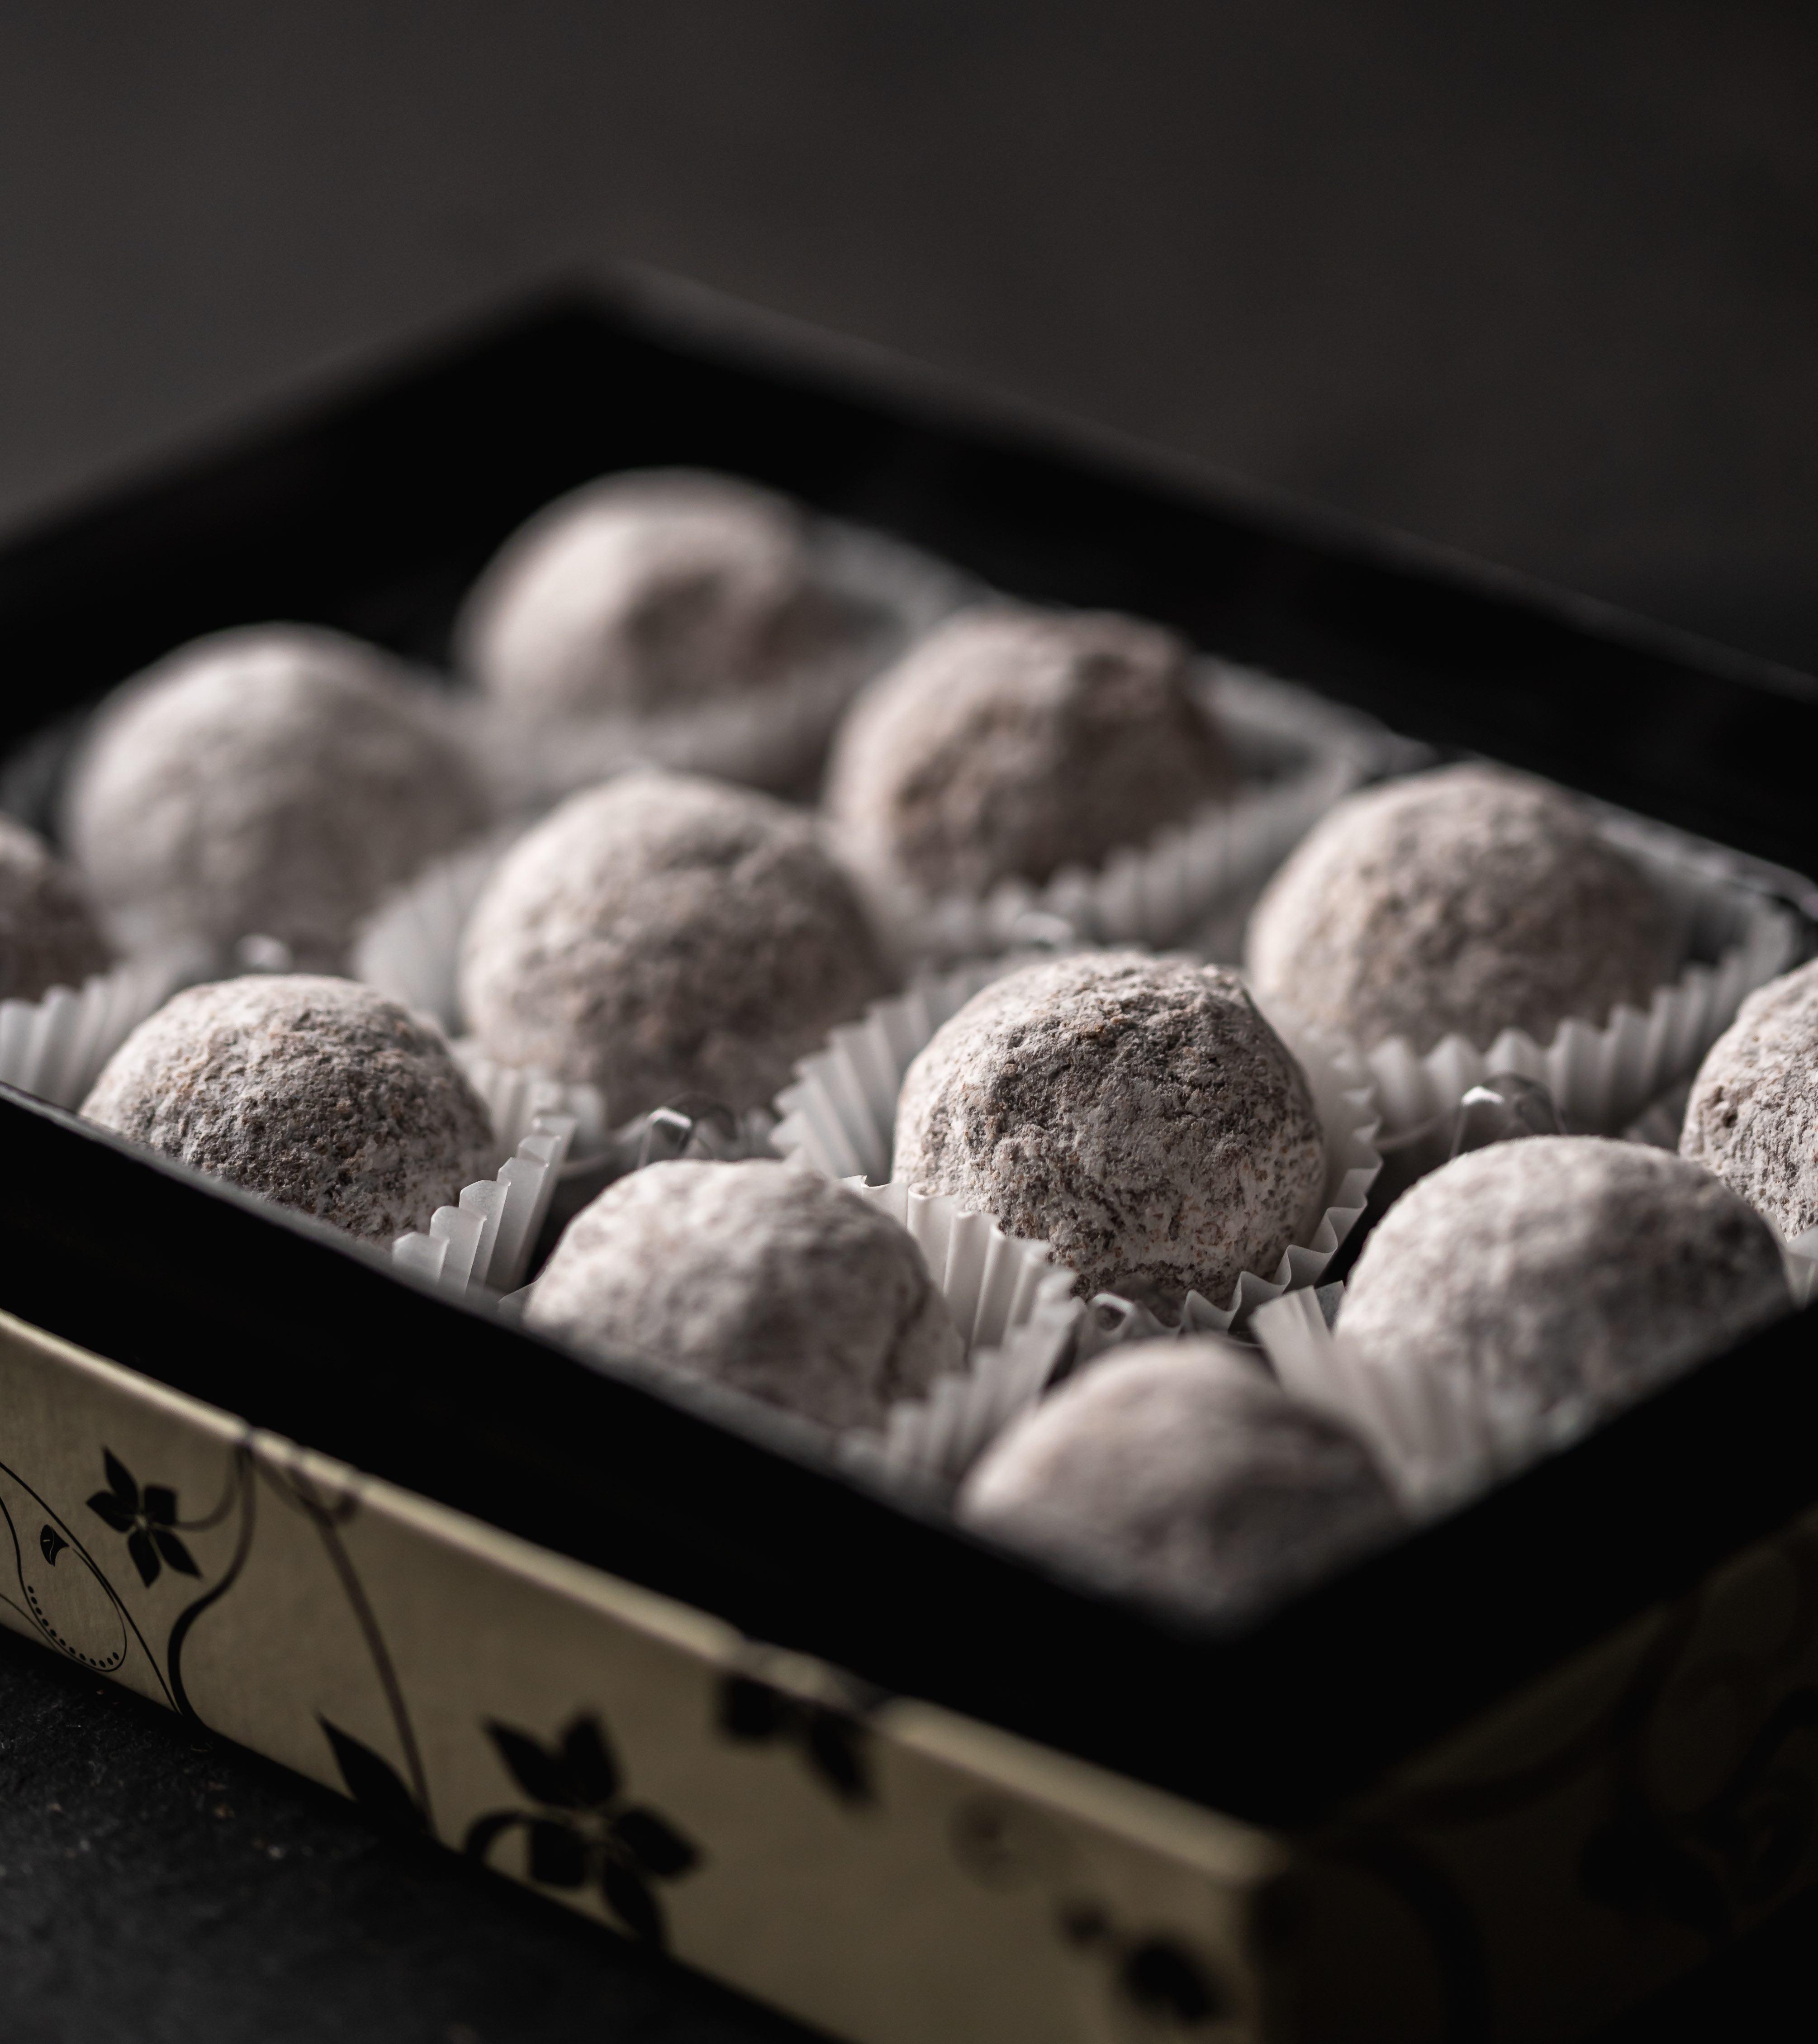 12 Milk Chocolate Marc de Champagne truffles. (Contain alcohol)